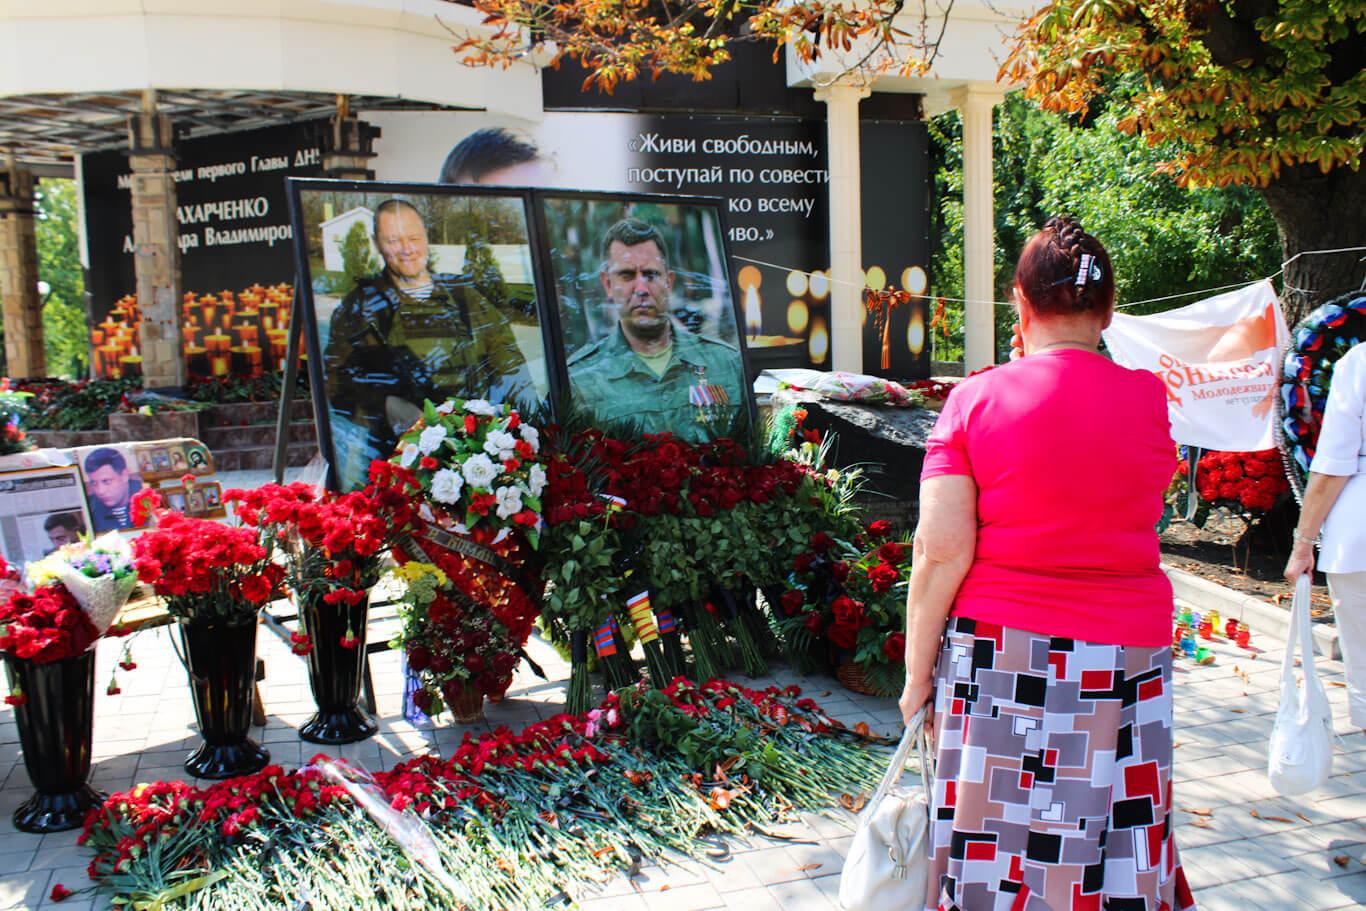 Donbass War Diary memorial